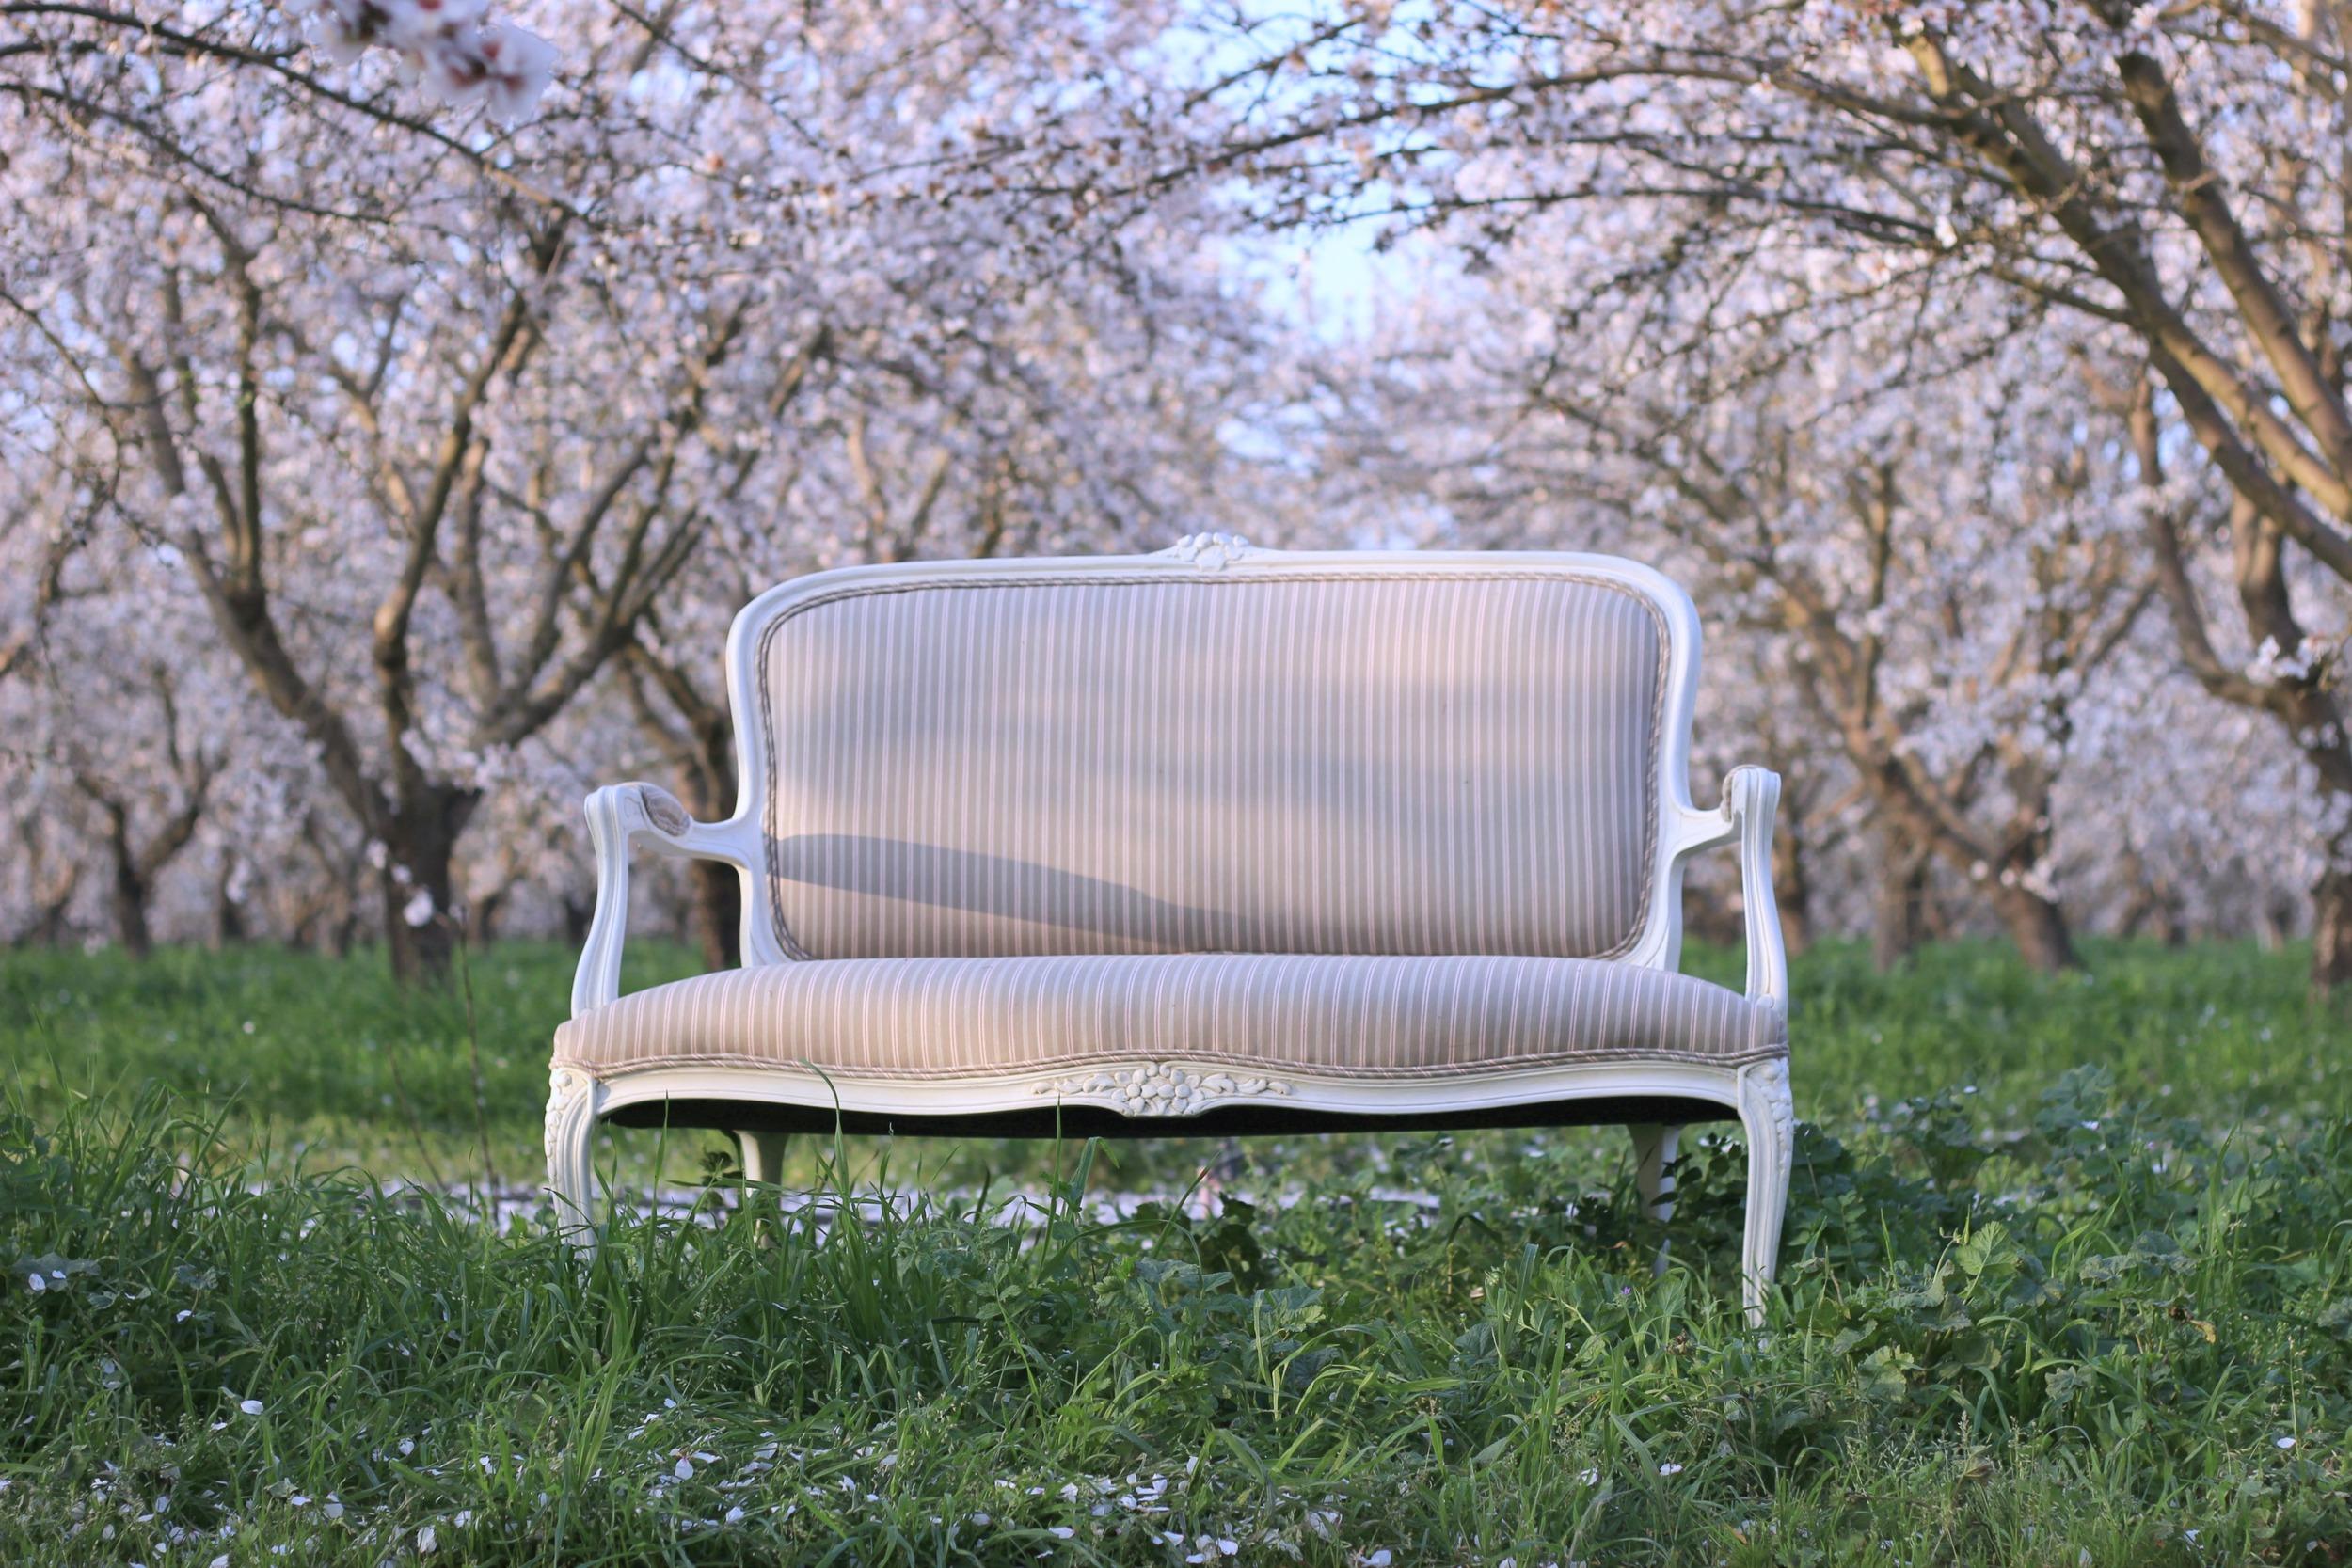 Vintage Wedding Rentals - Love Seat - Settee